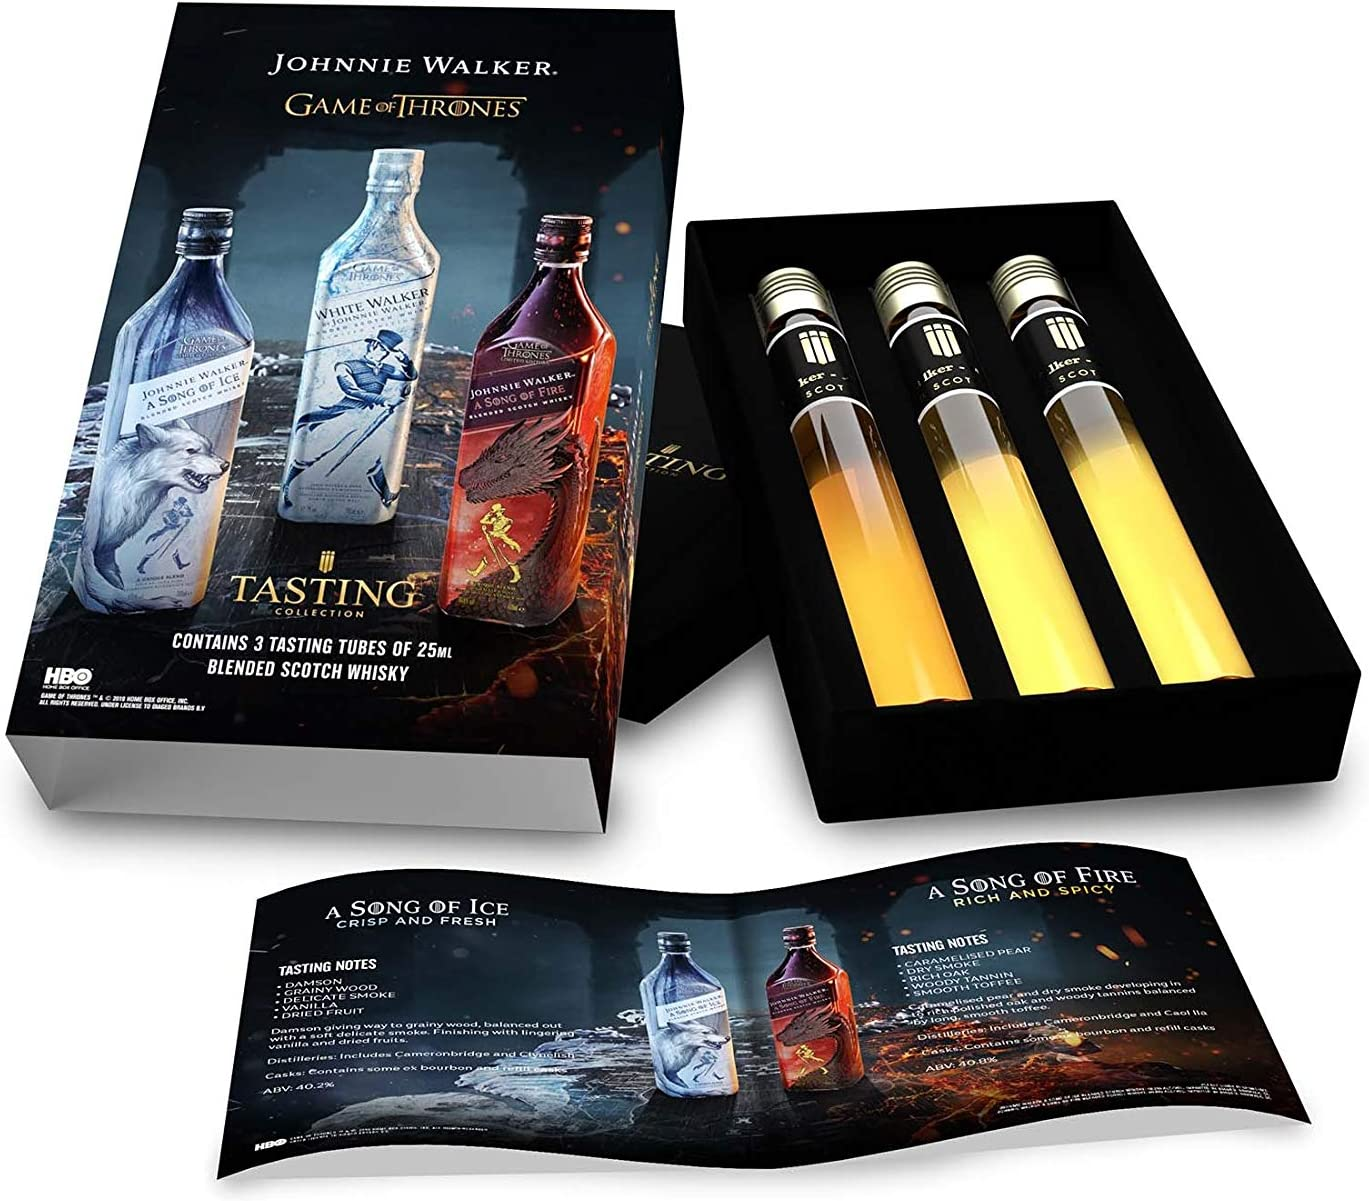 Johnnie Walker - Game Of Thrones 3 x Miniatures Tasting Pack Gift Set - Whisky